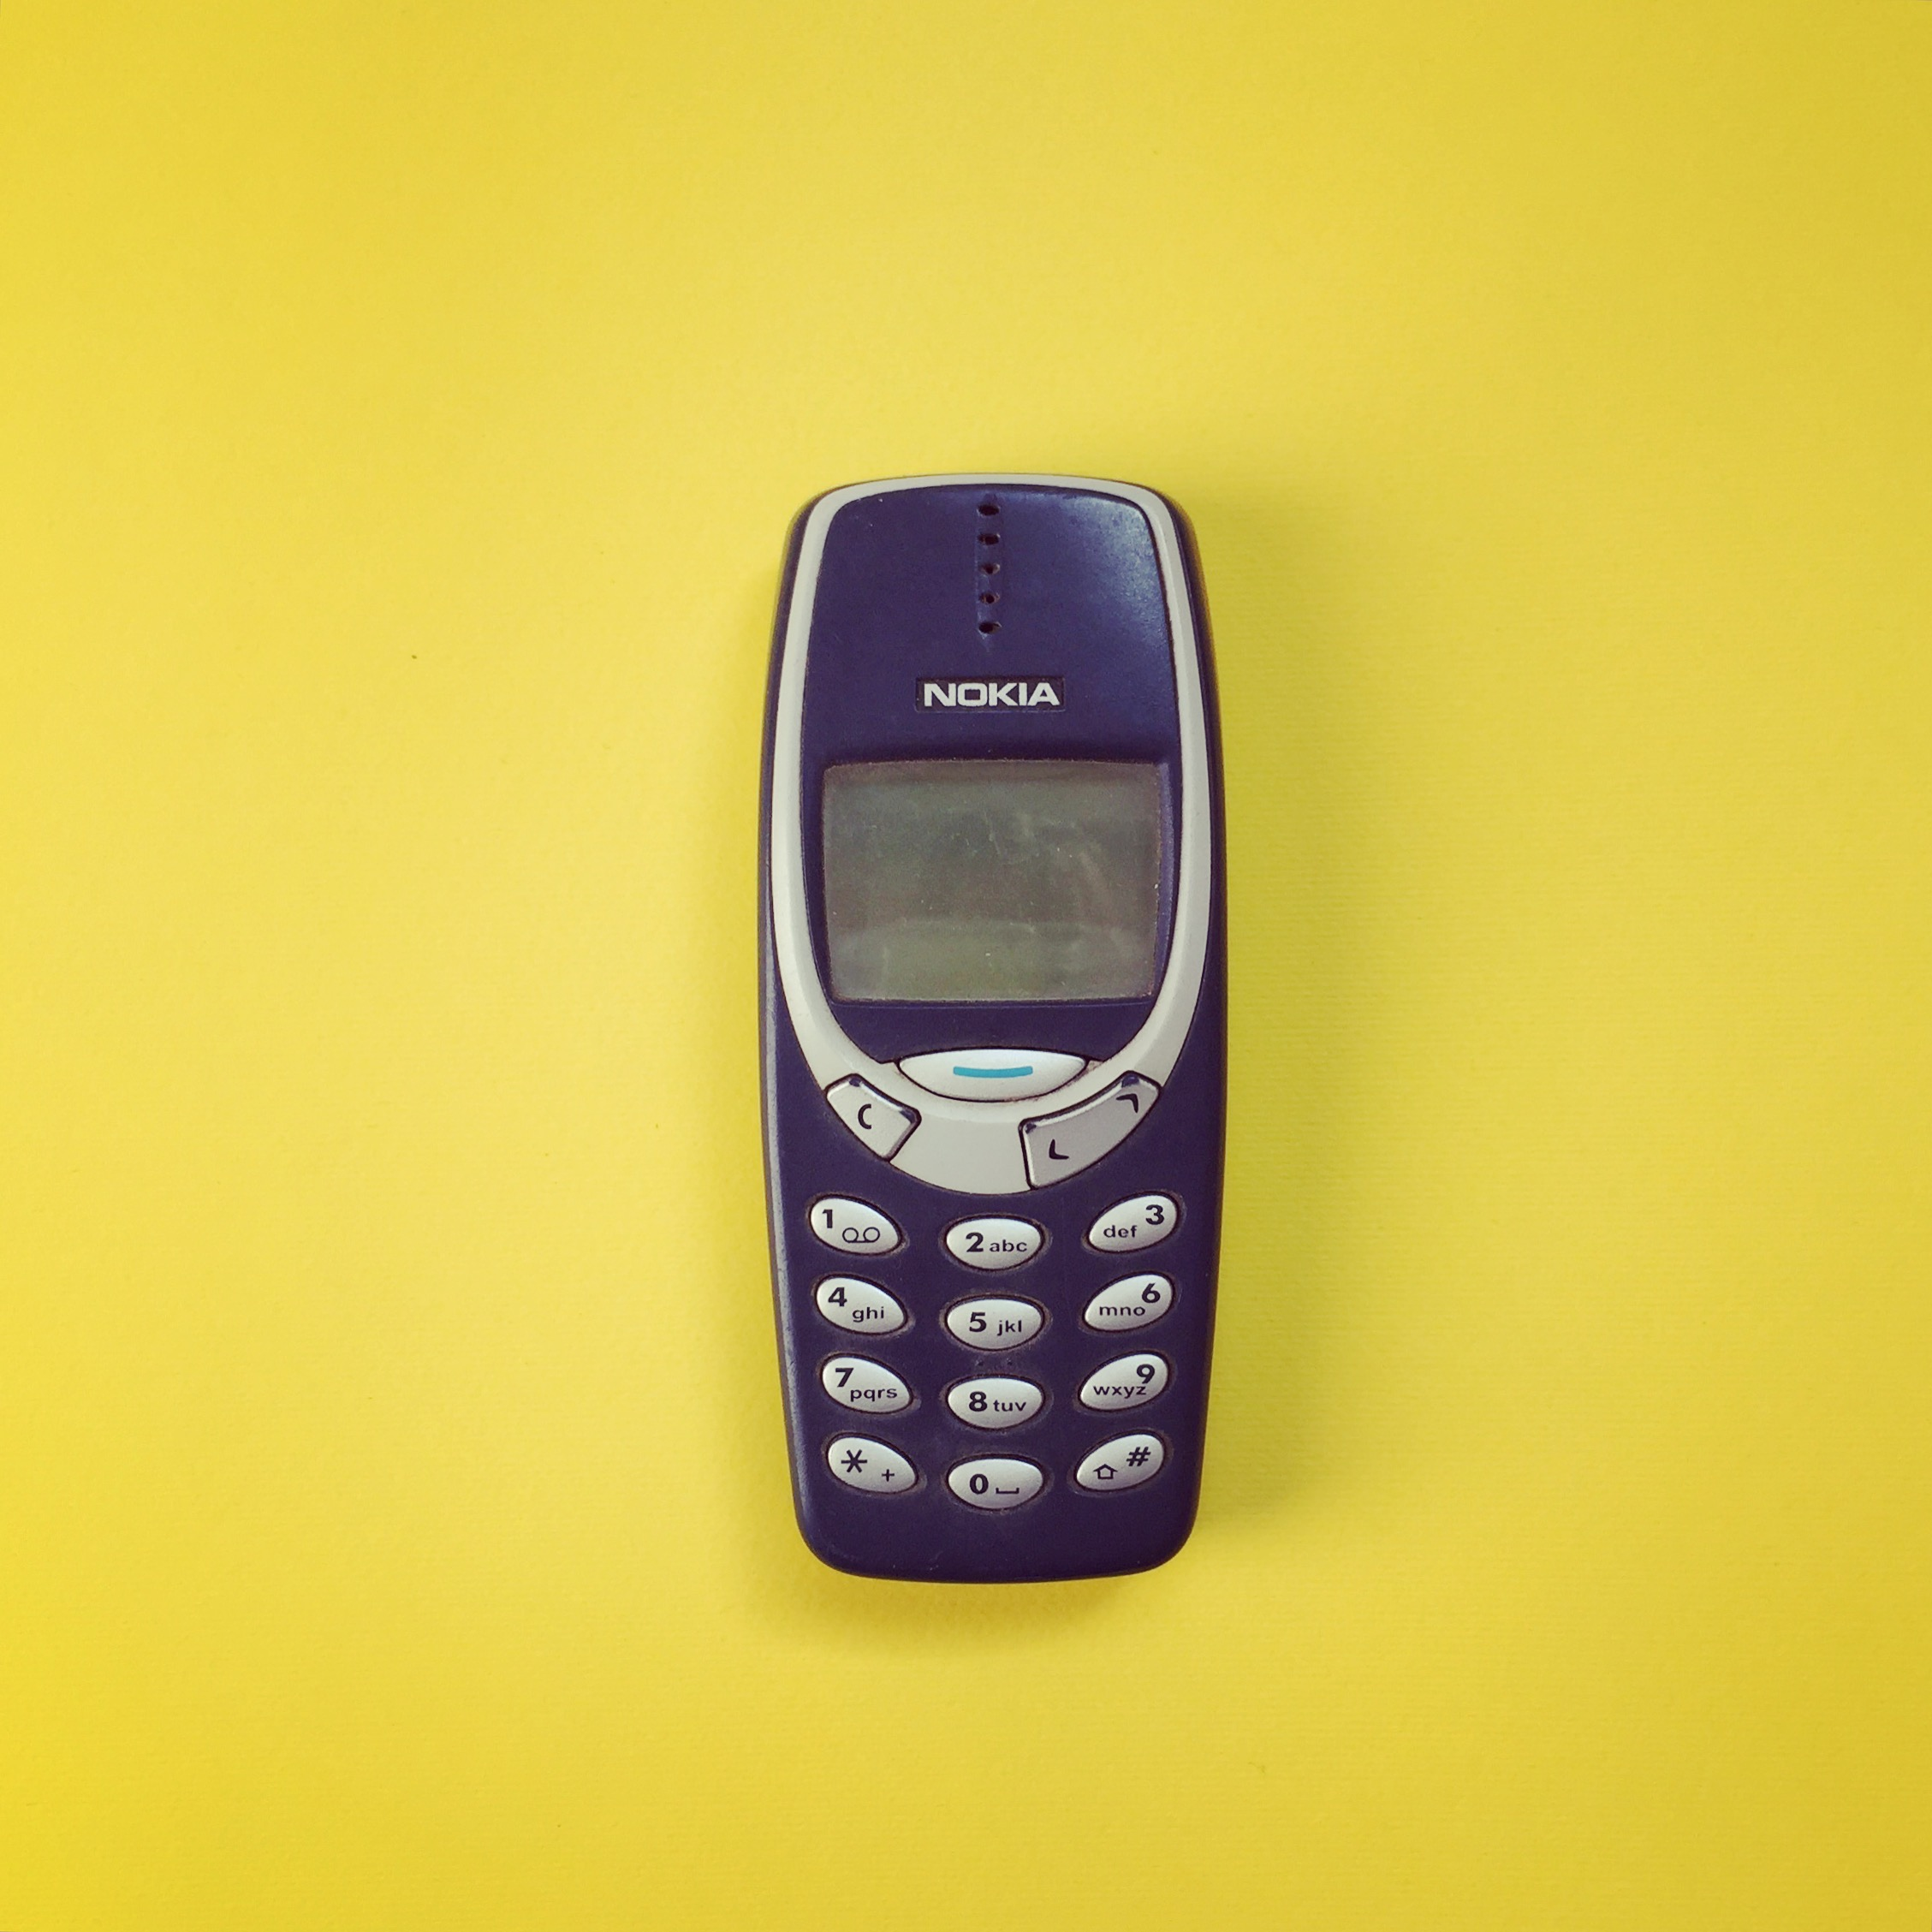 Tinker Friday - Old Nokia Phone